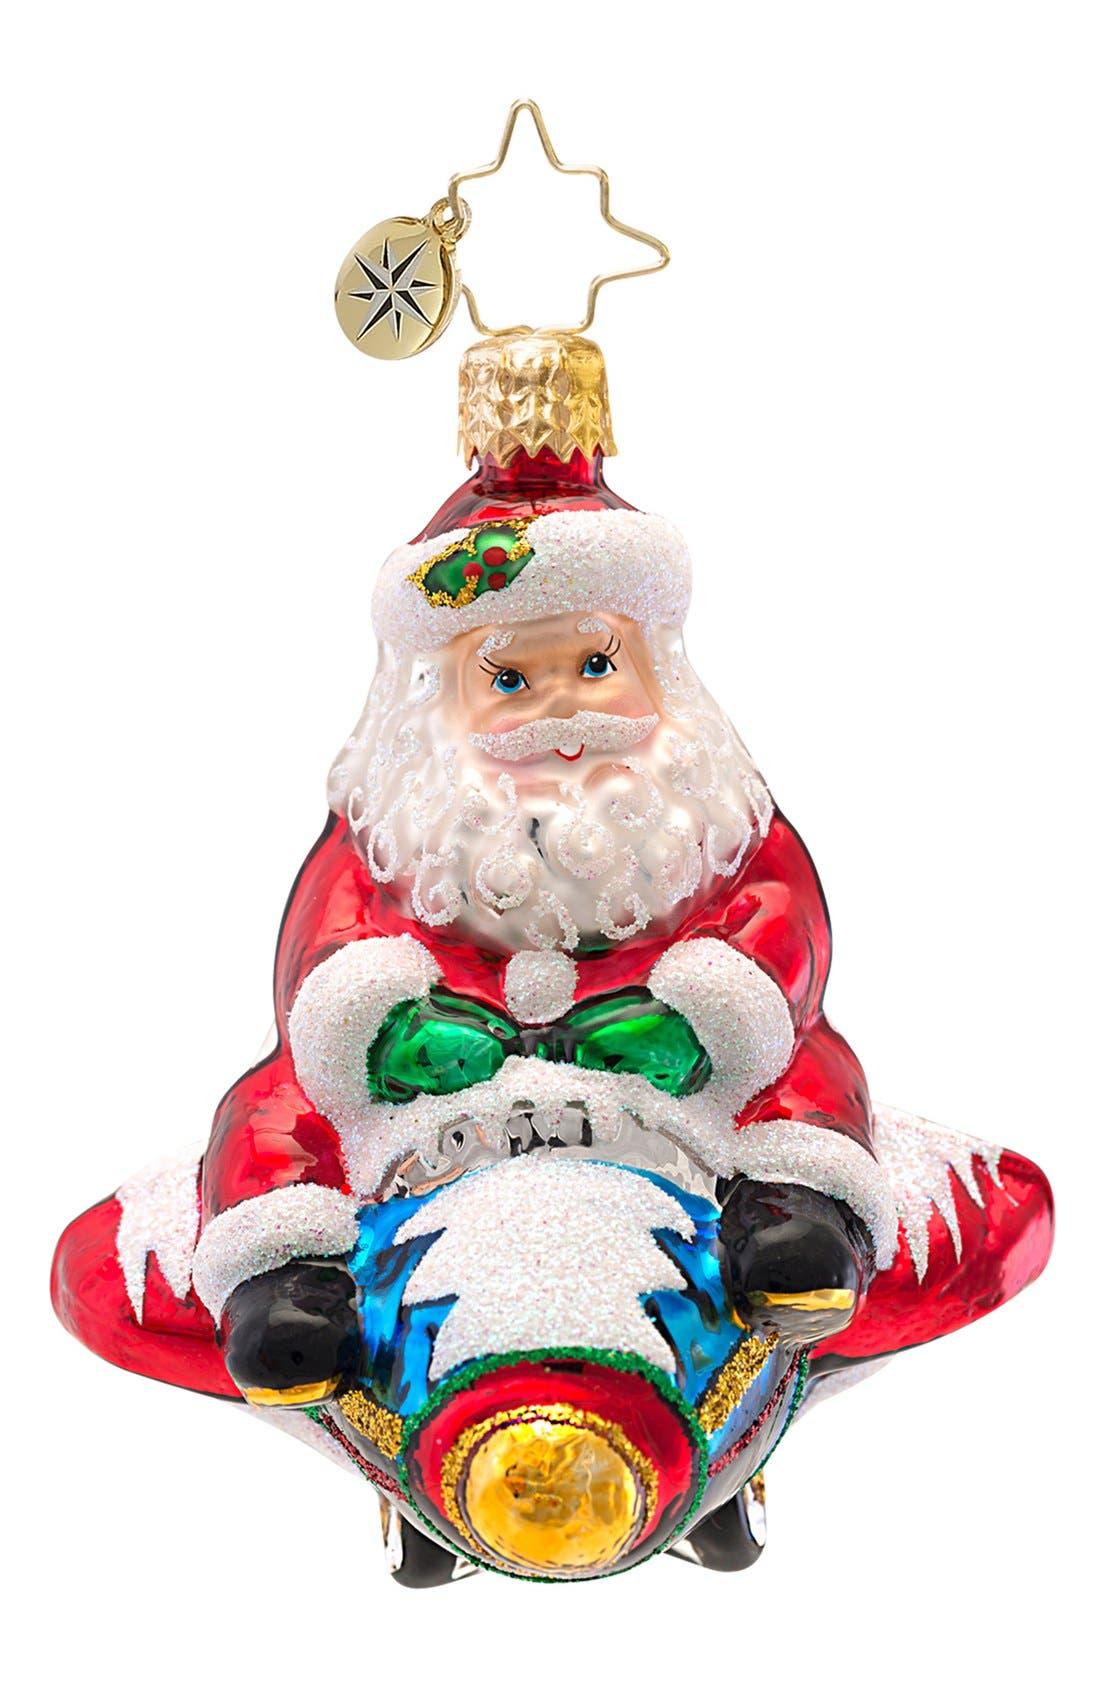 Alternate Image 1 Selected - Christopher Radko 'Jet Set Santa - Little Gem' Ornament